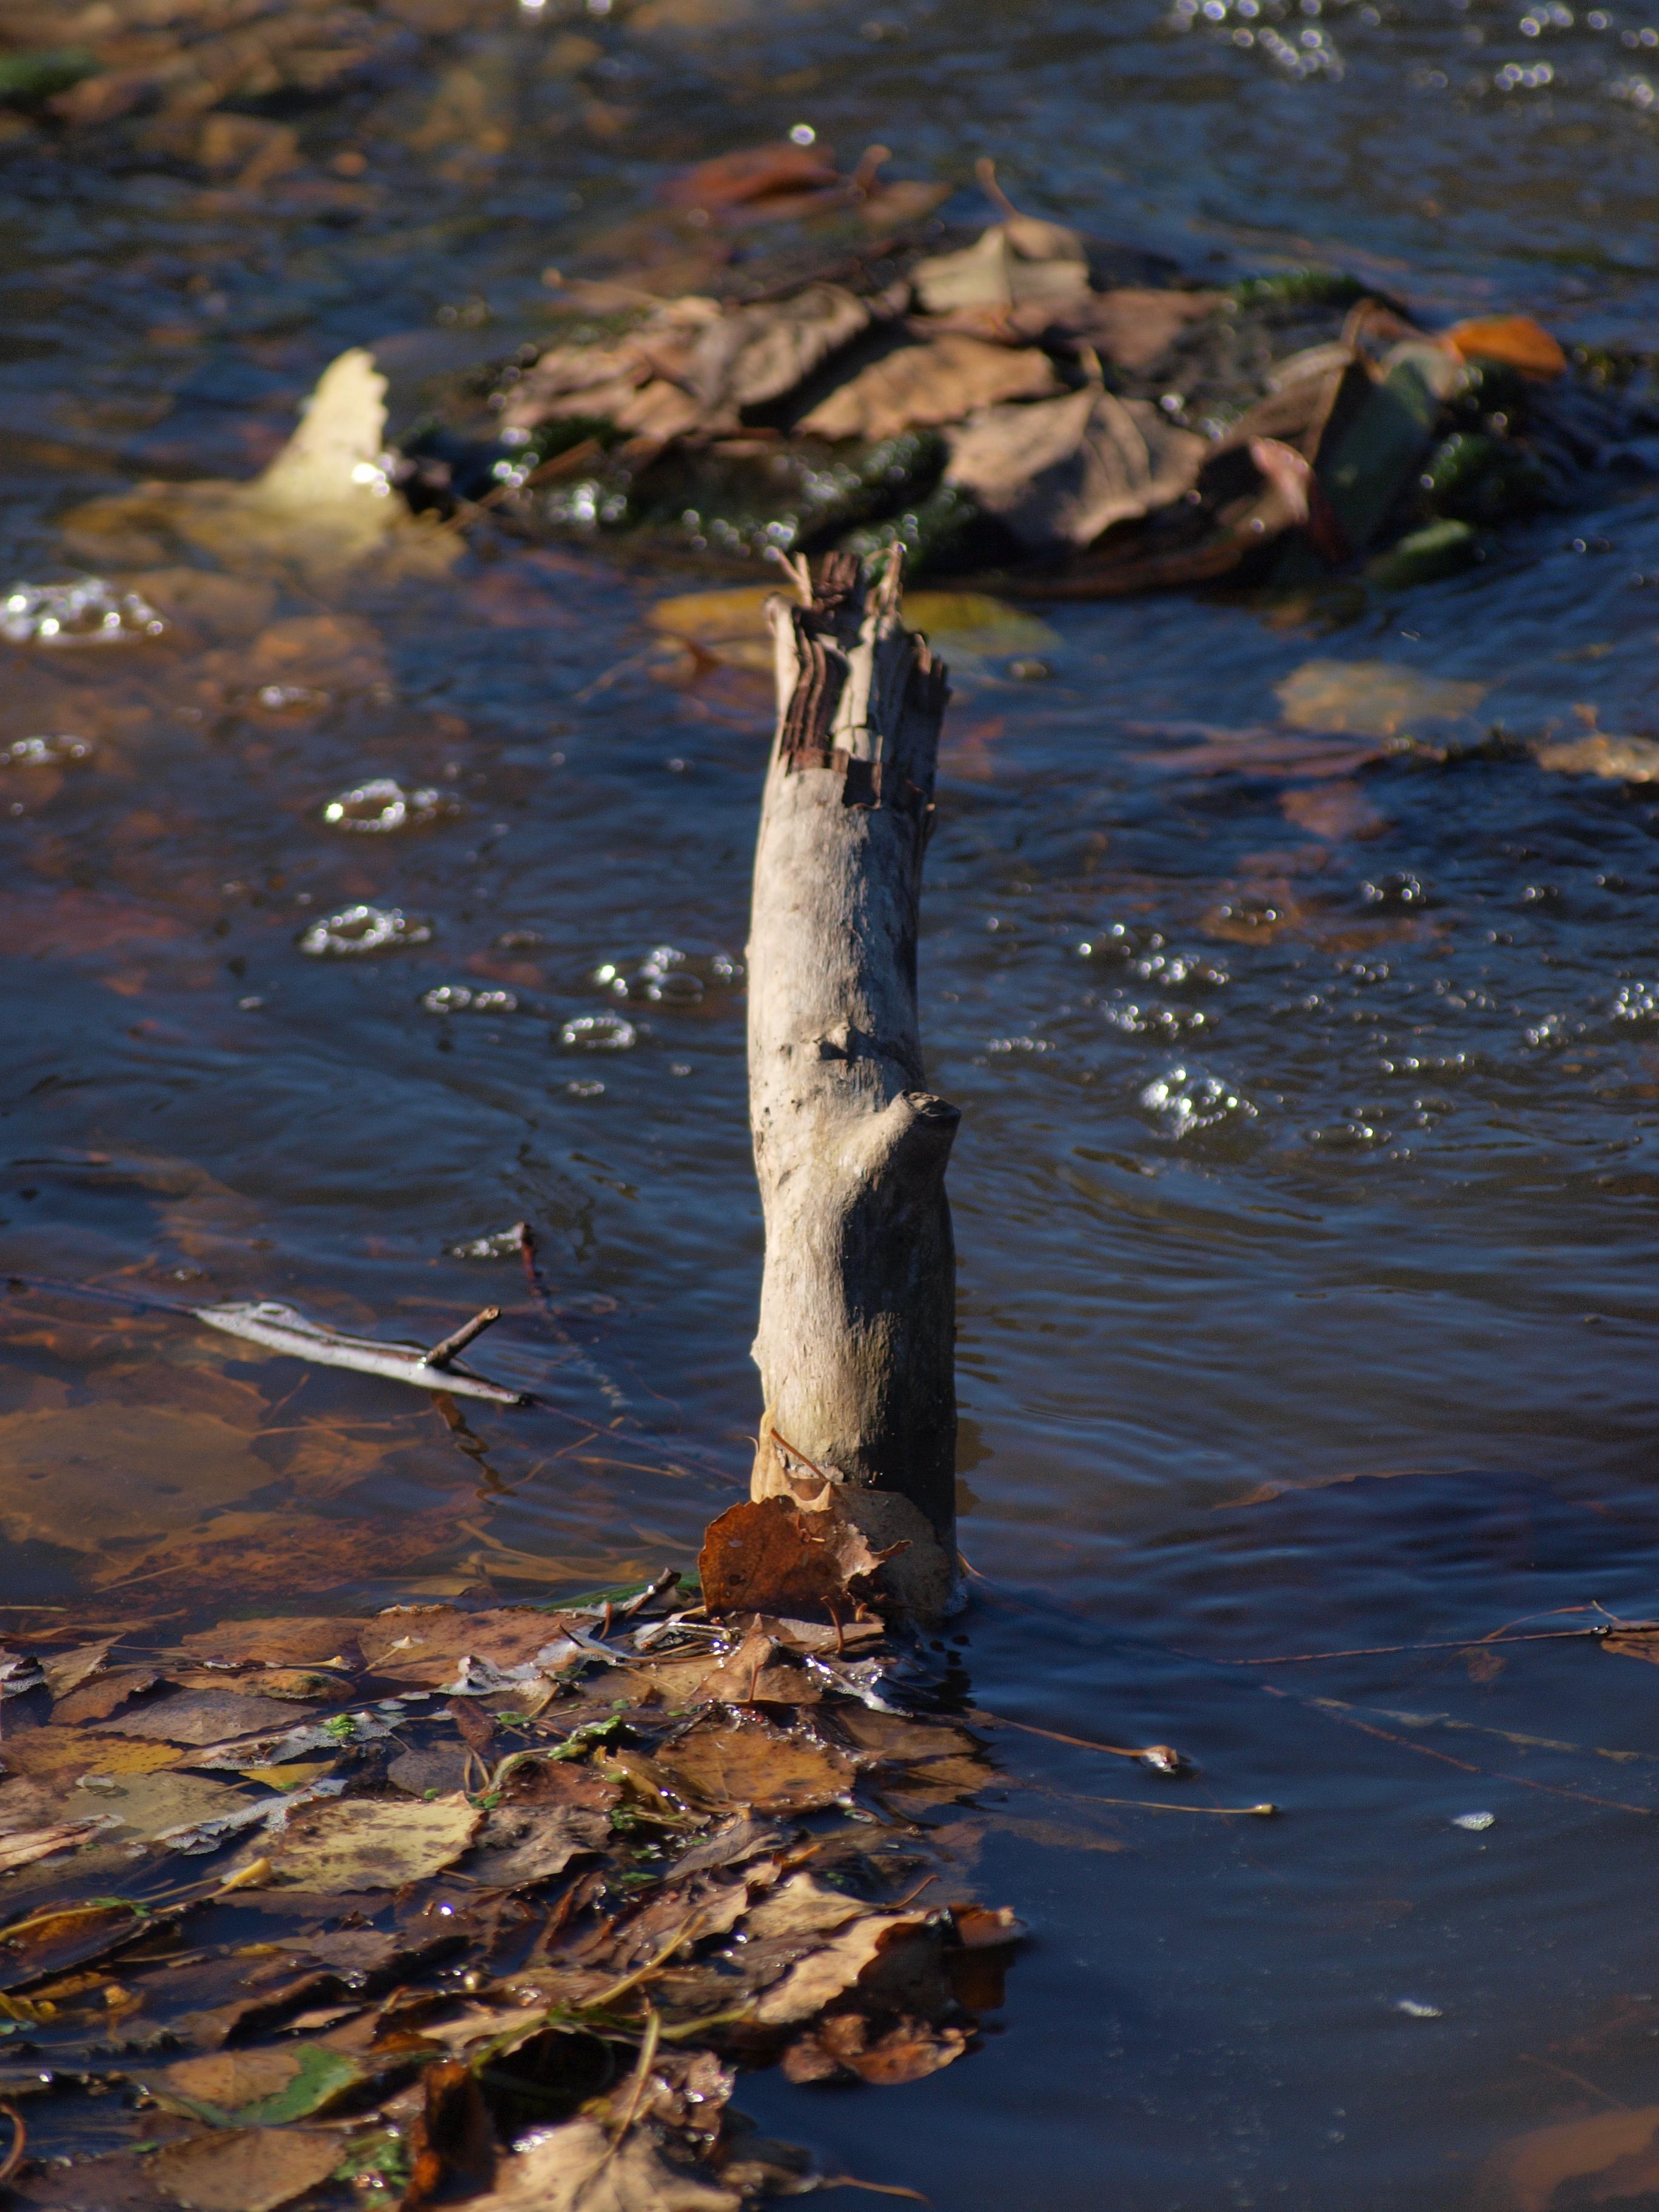 Branch, Fall, Leaf, Stick, Water, HQ Photo